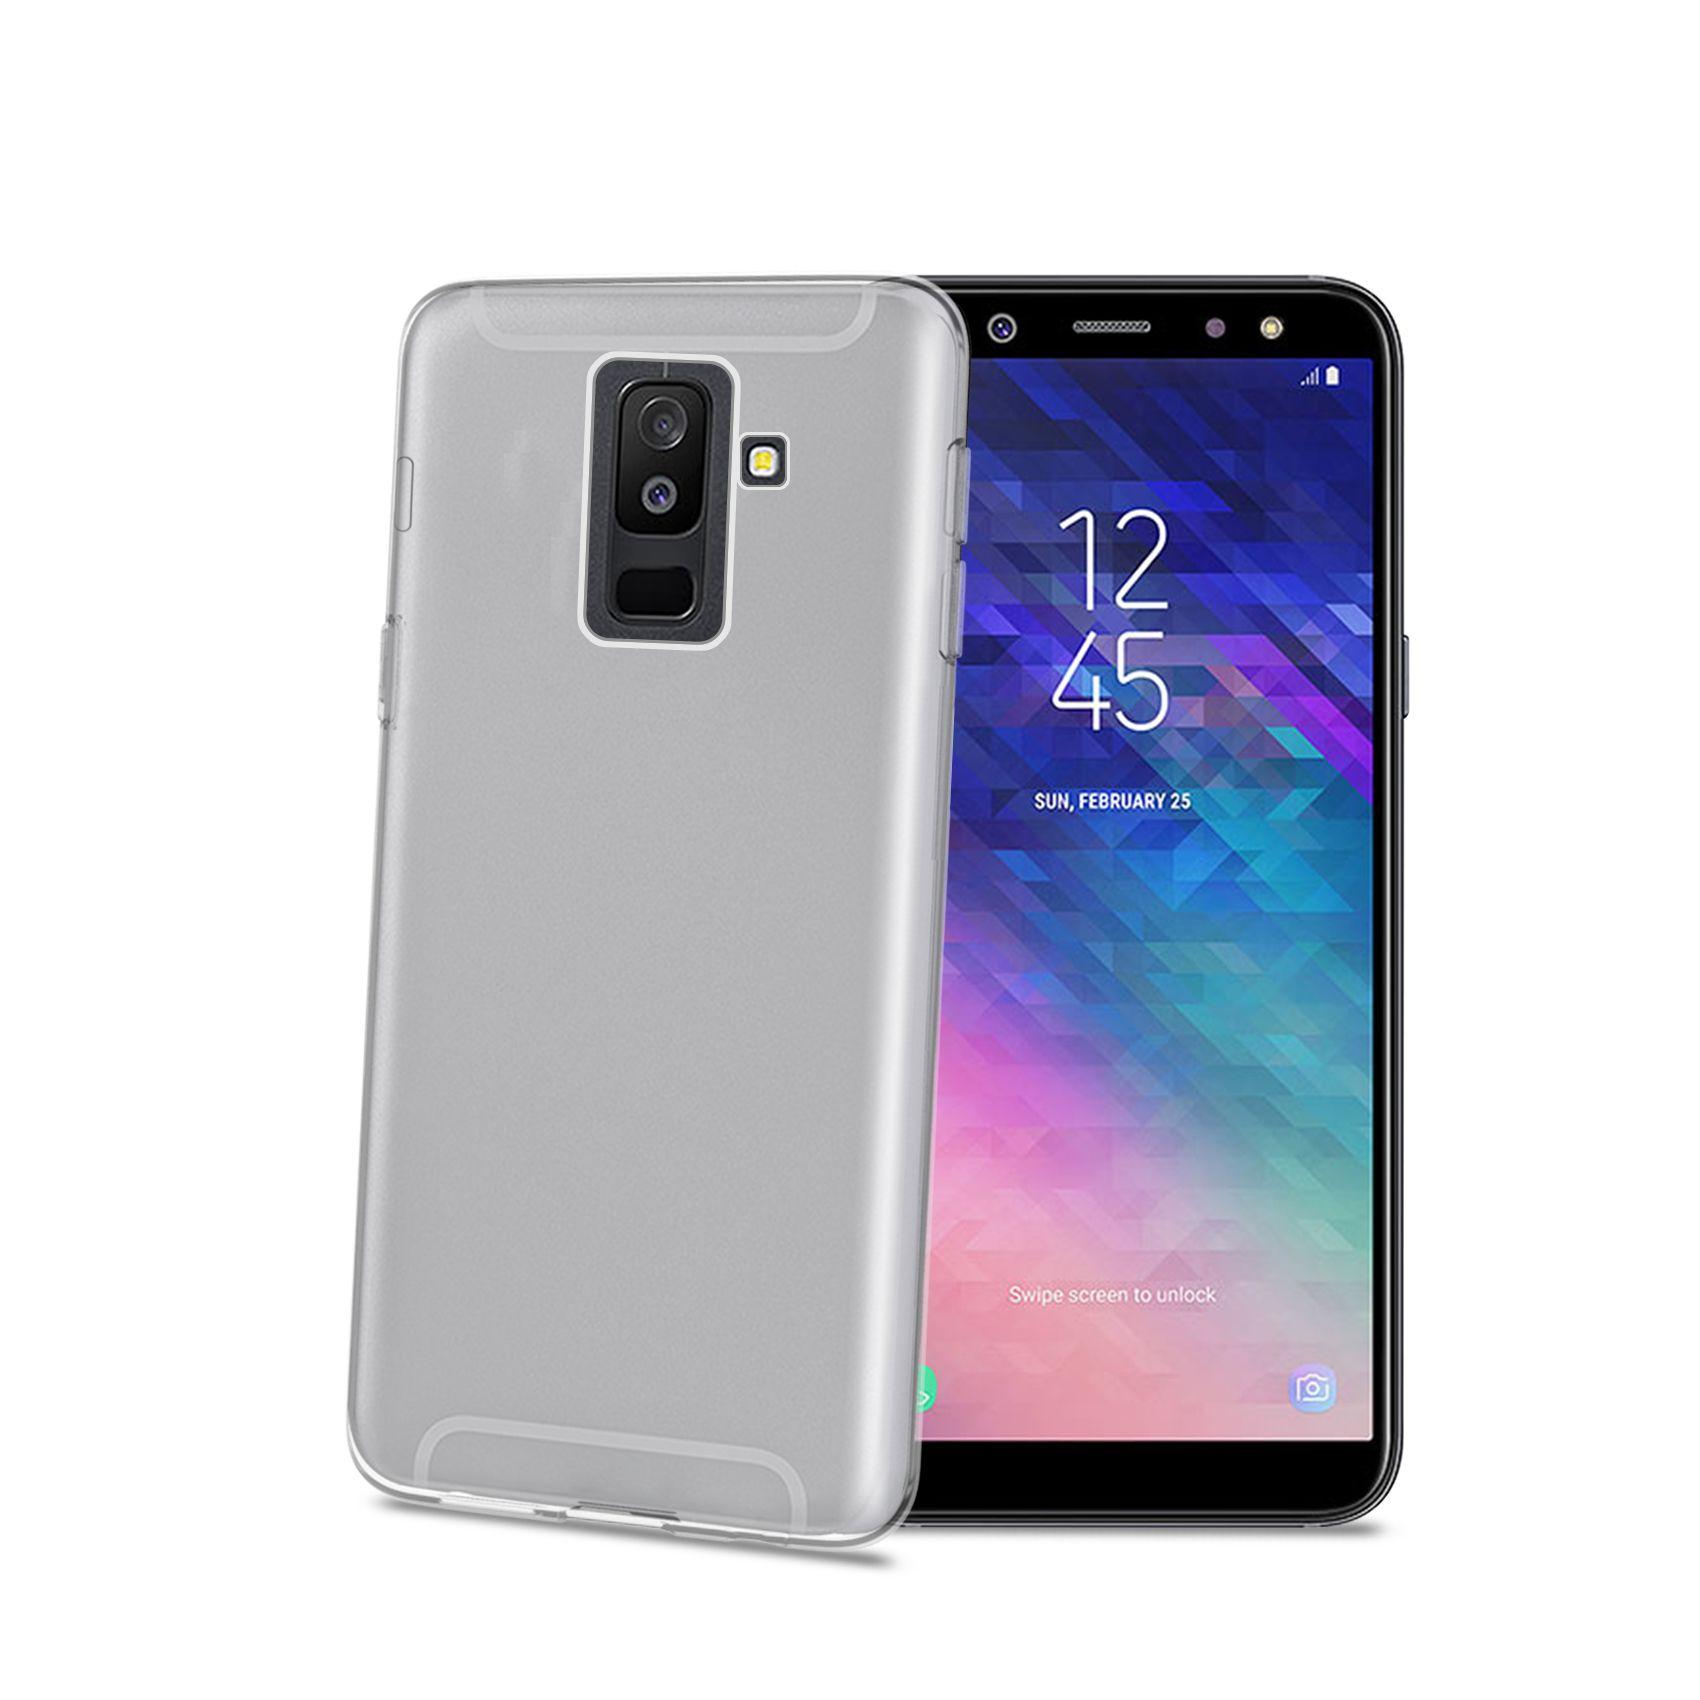 TPU pouzdro CELLY Gelskin pro Samsung Galaxy A6+ (2018), bezbarvé